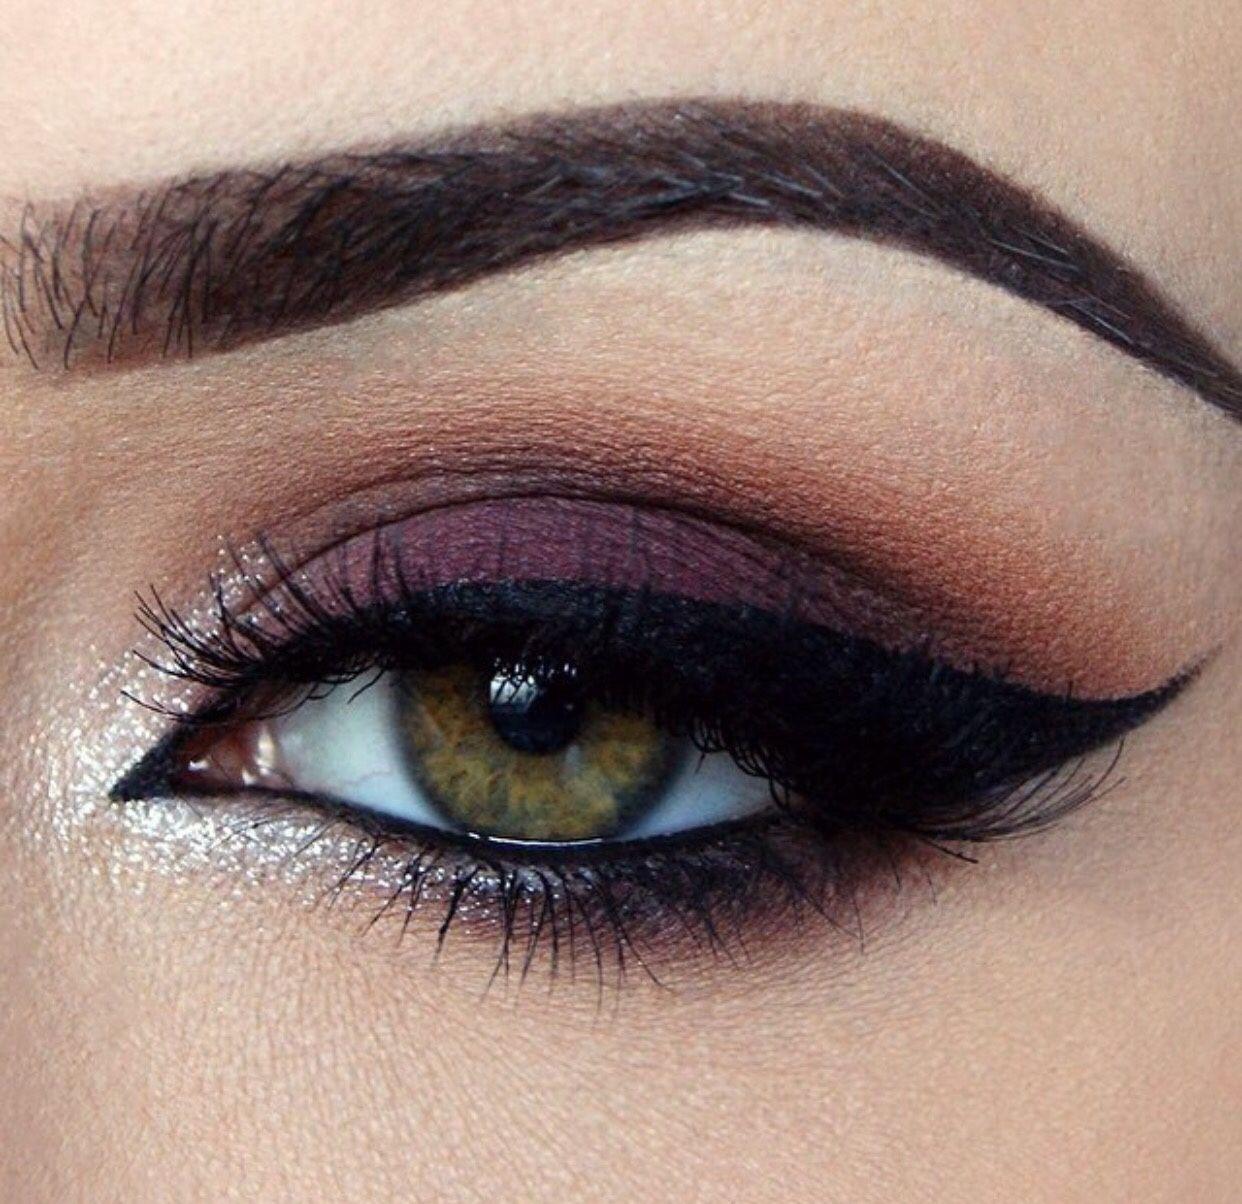 Eye Makeup Dark Purple Eye Shadow Strong Dark Eyeliner And White